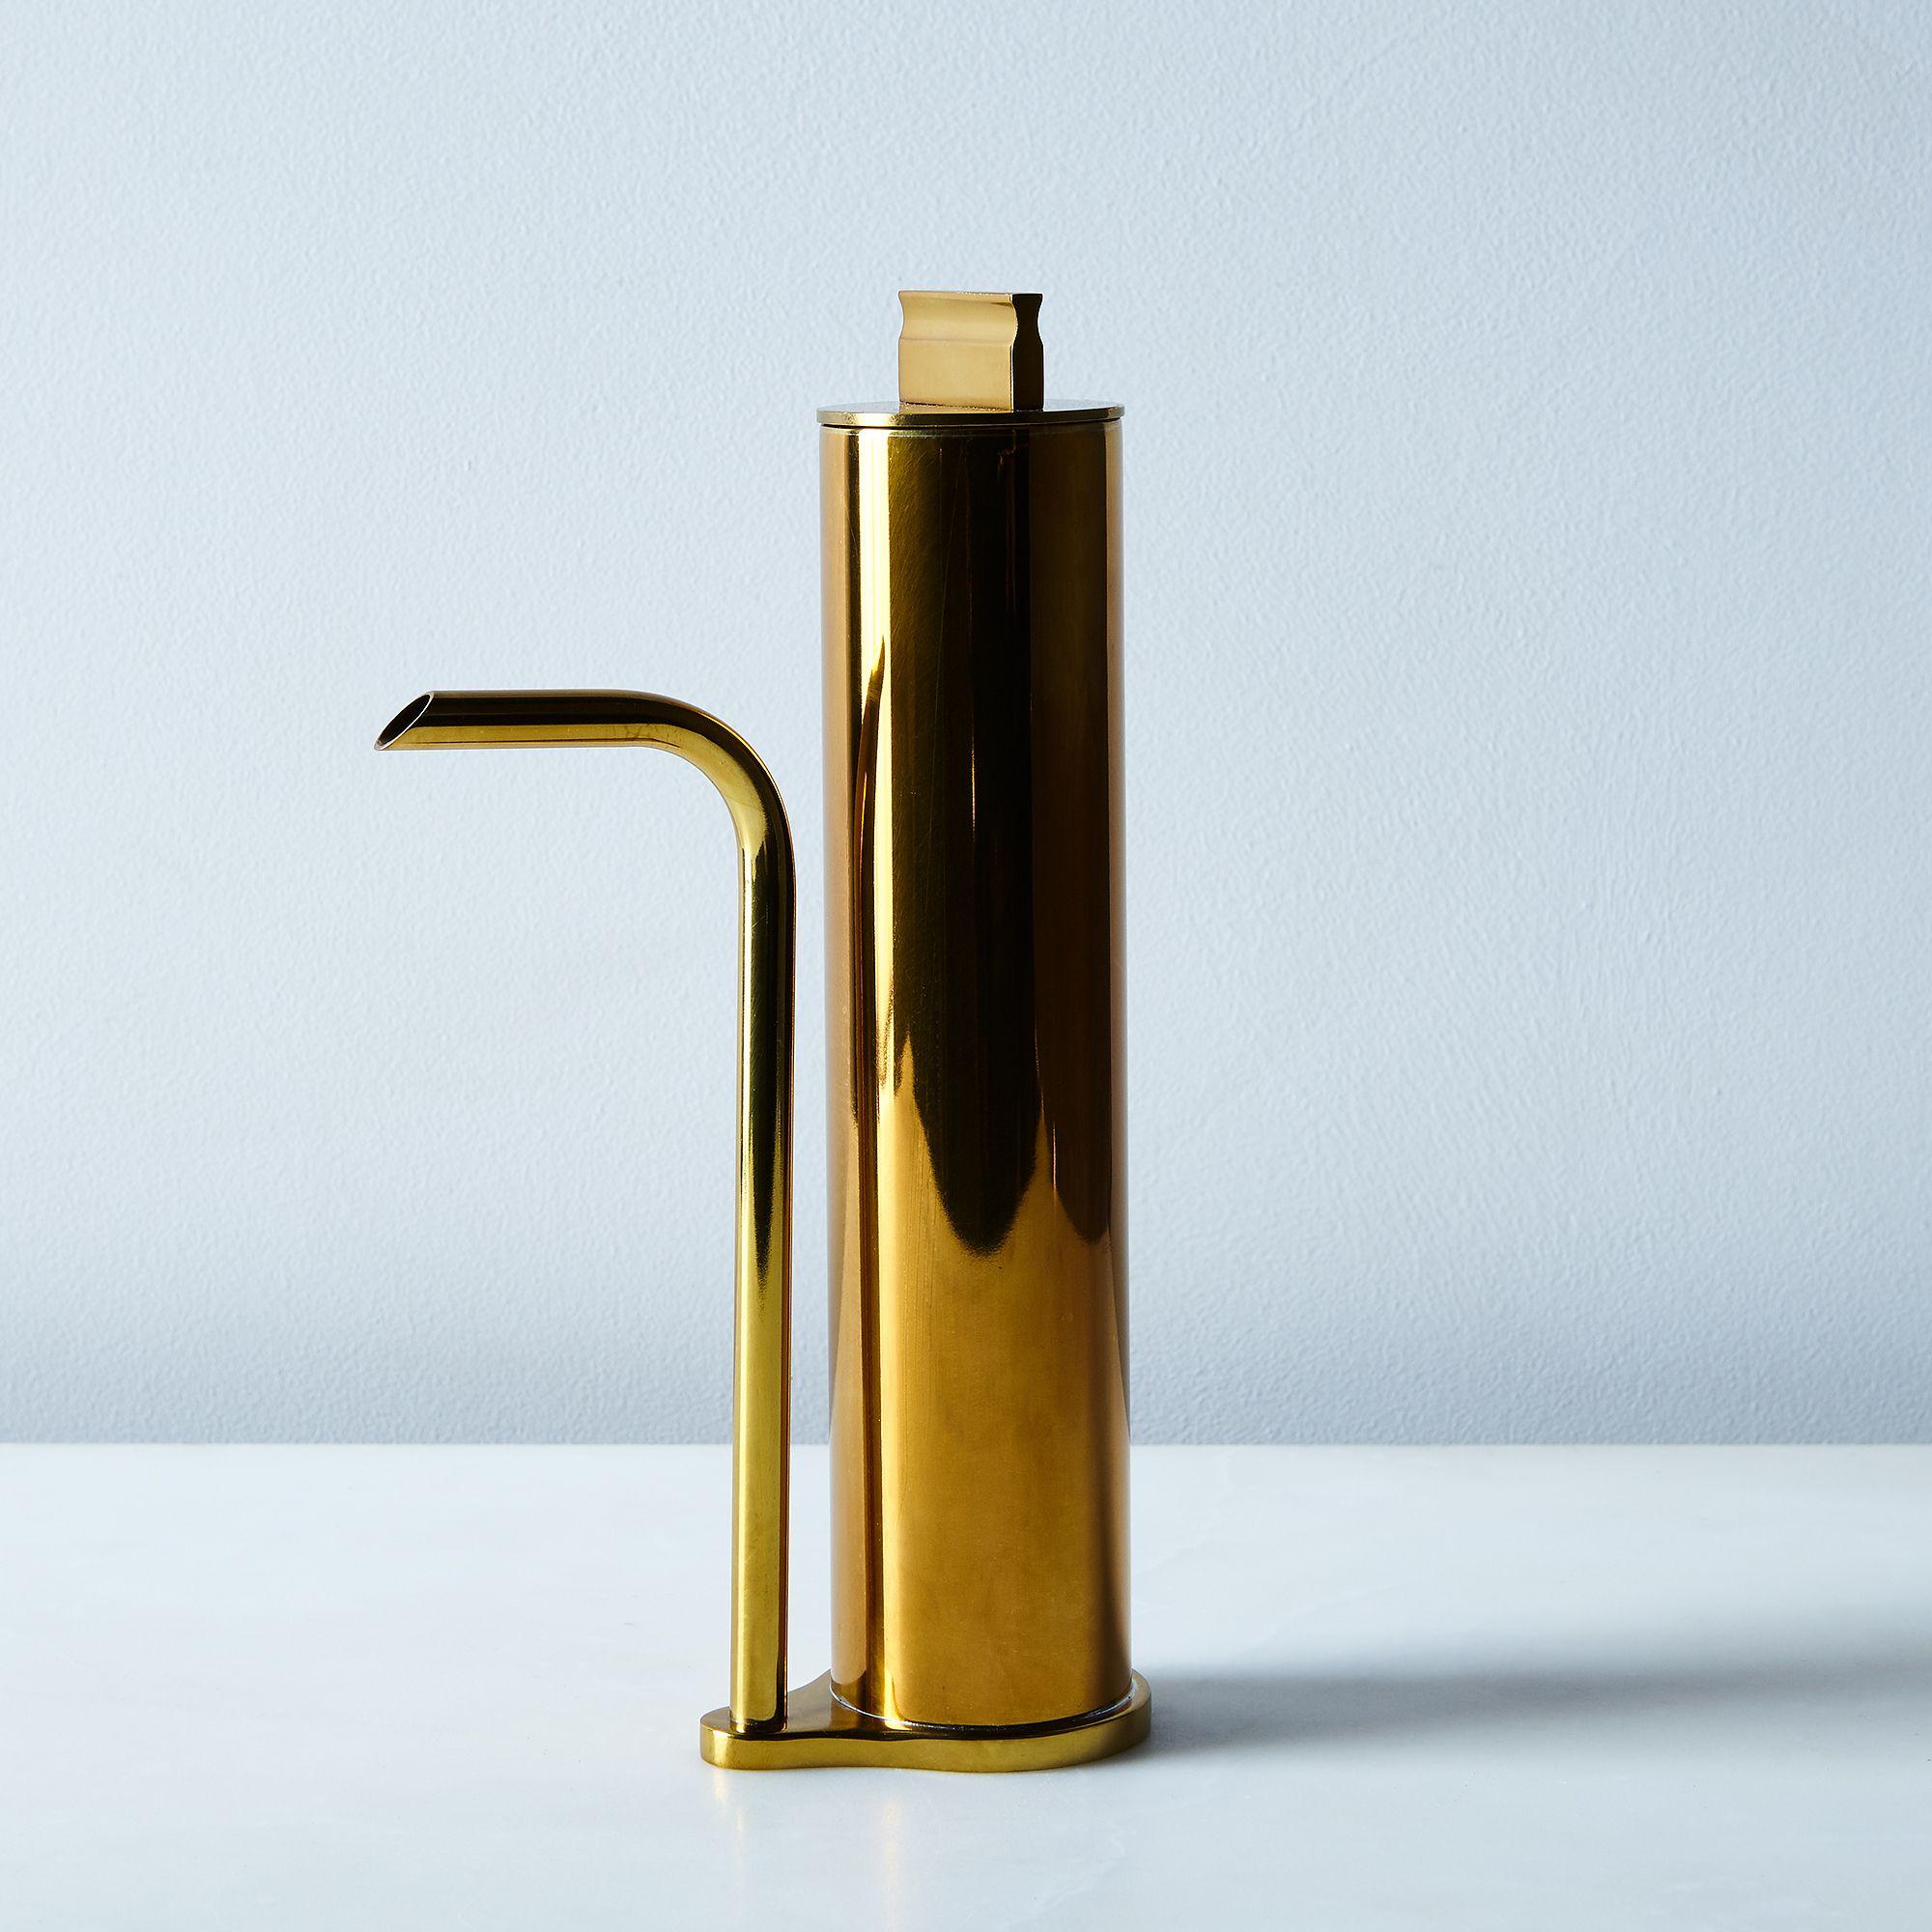 71f98531 be6d 4277 9978 5218bd409fb0  2016 1209 gentner oil decanter shiny brass silo rocky luten 027